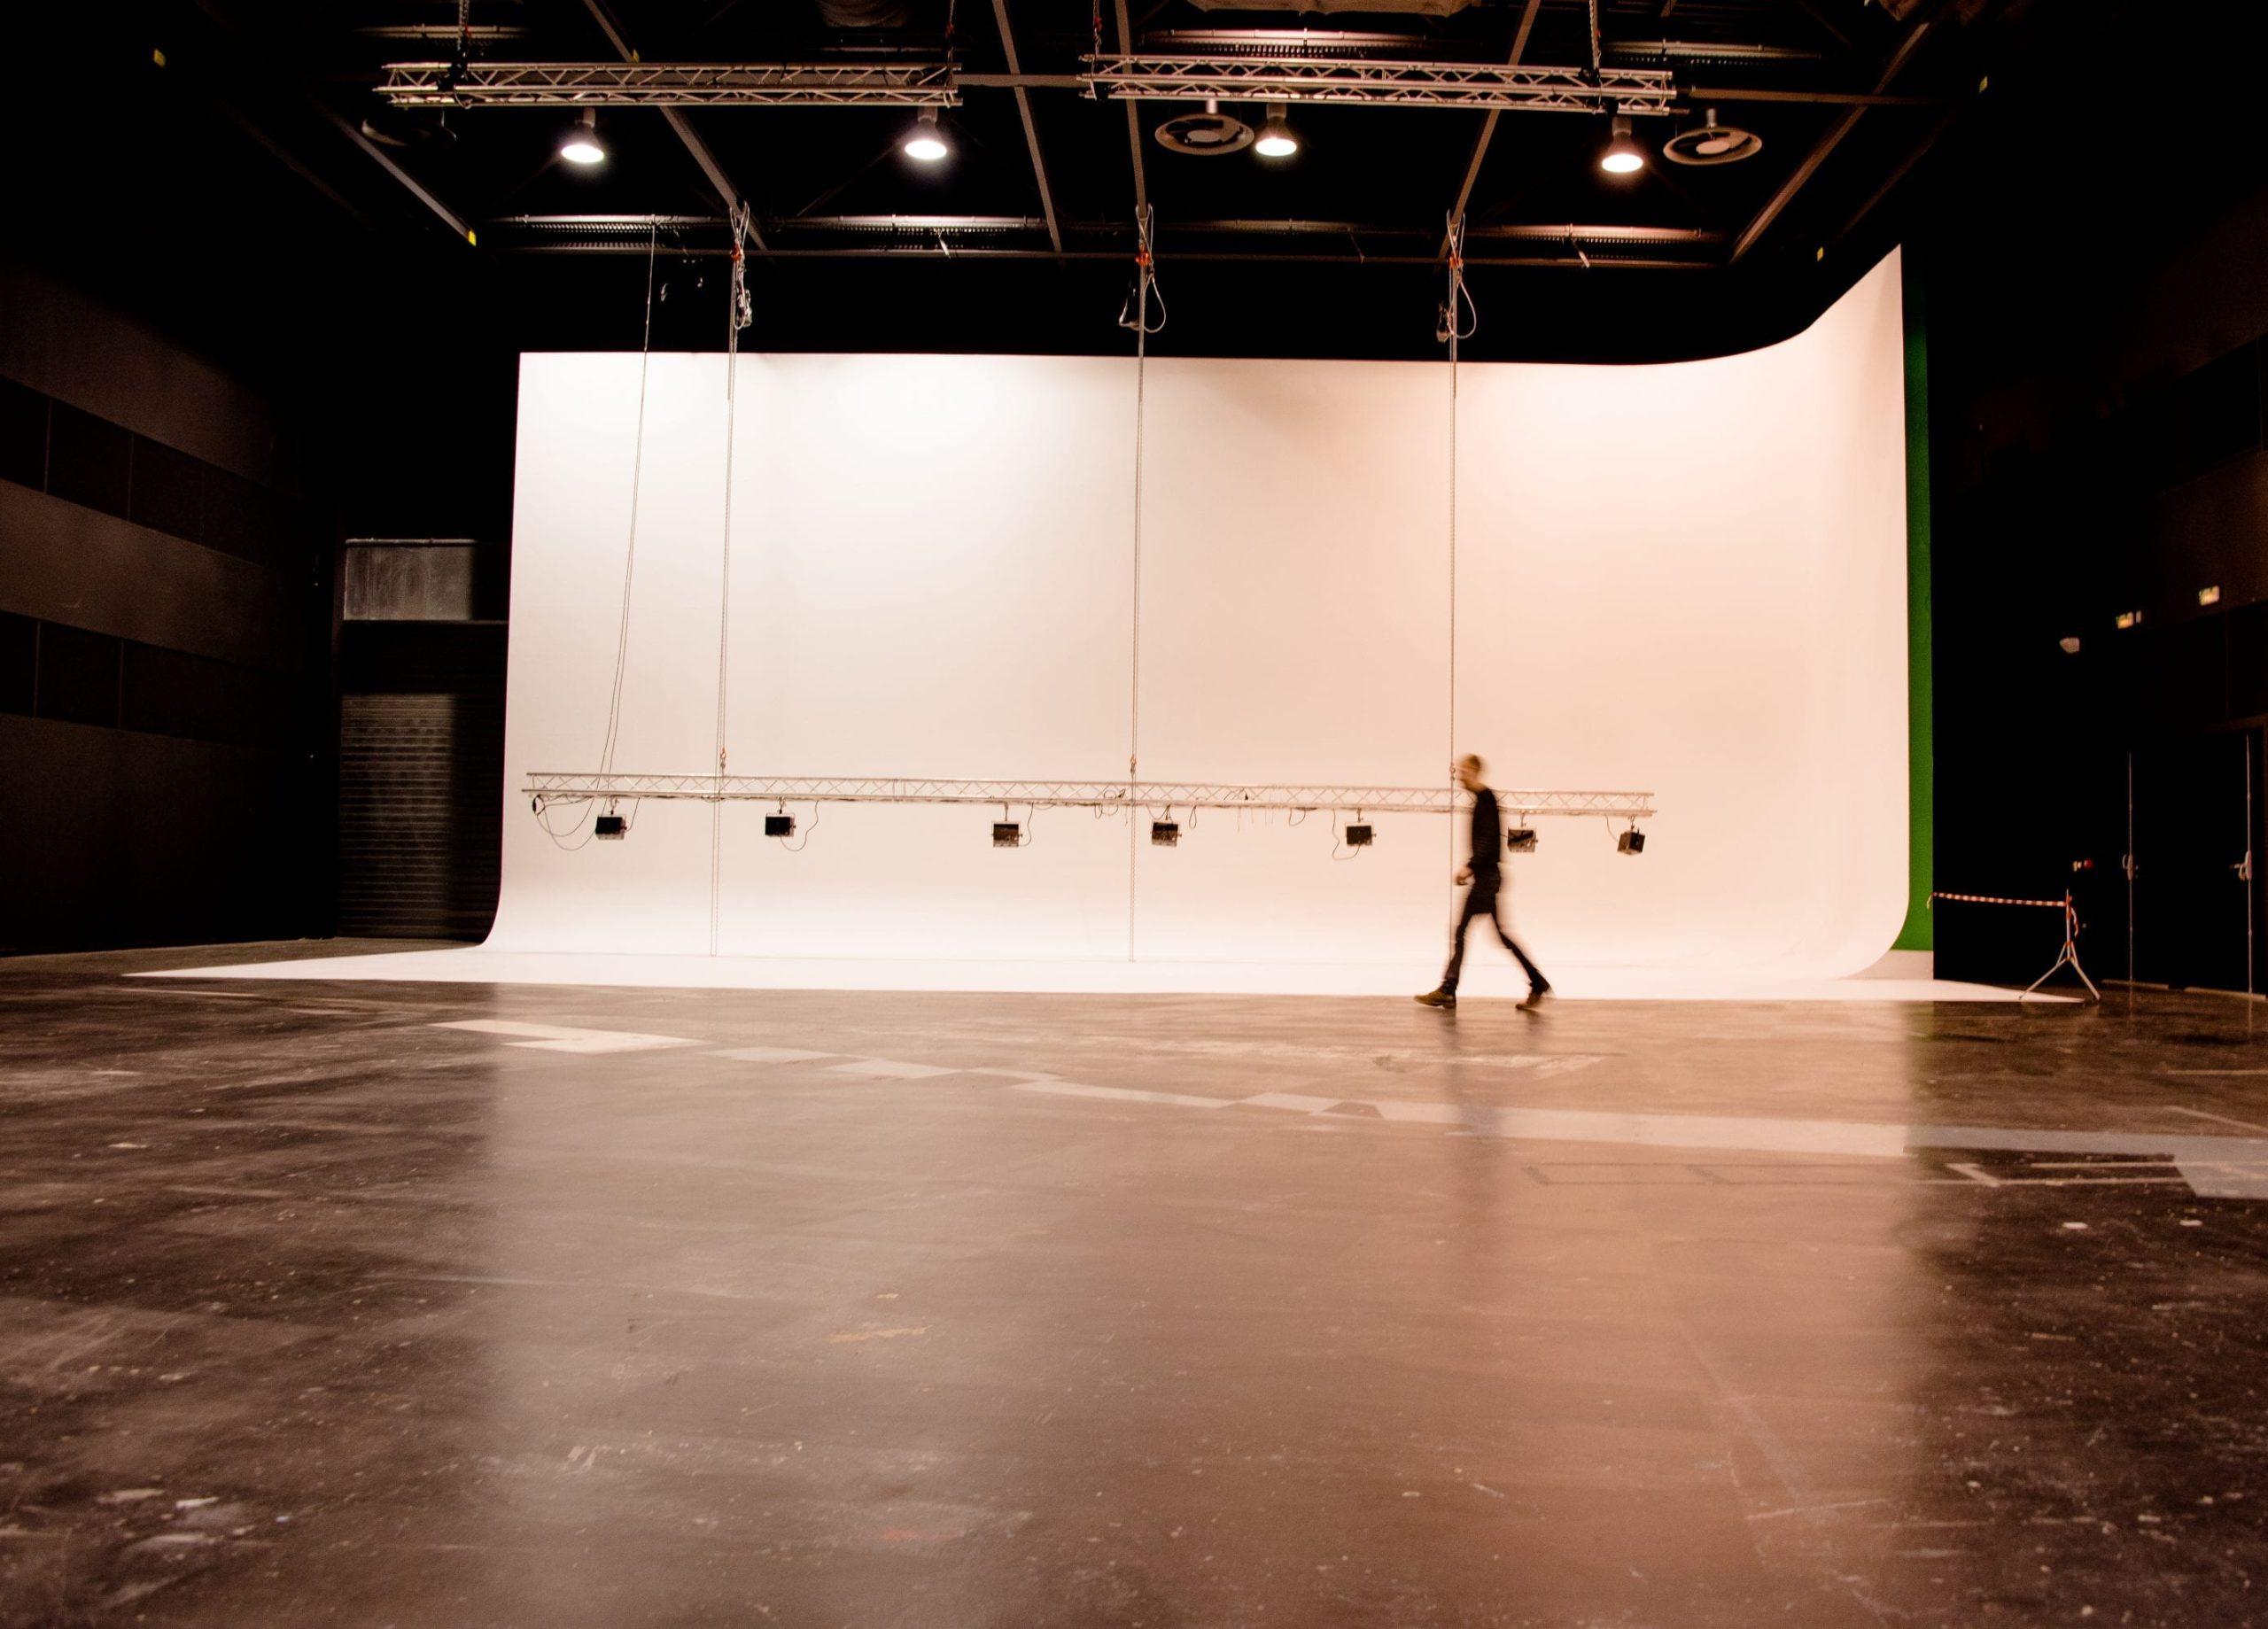 studio de tournage à Roubaix Tourcoing